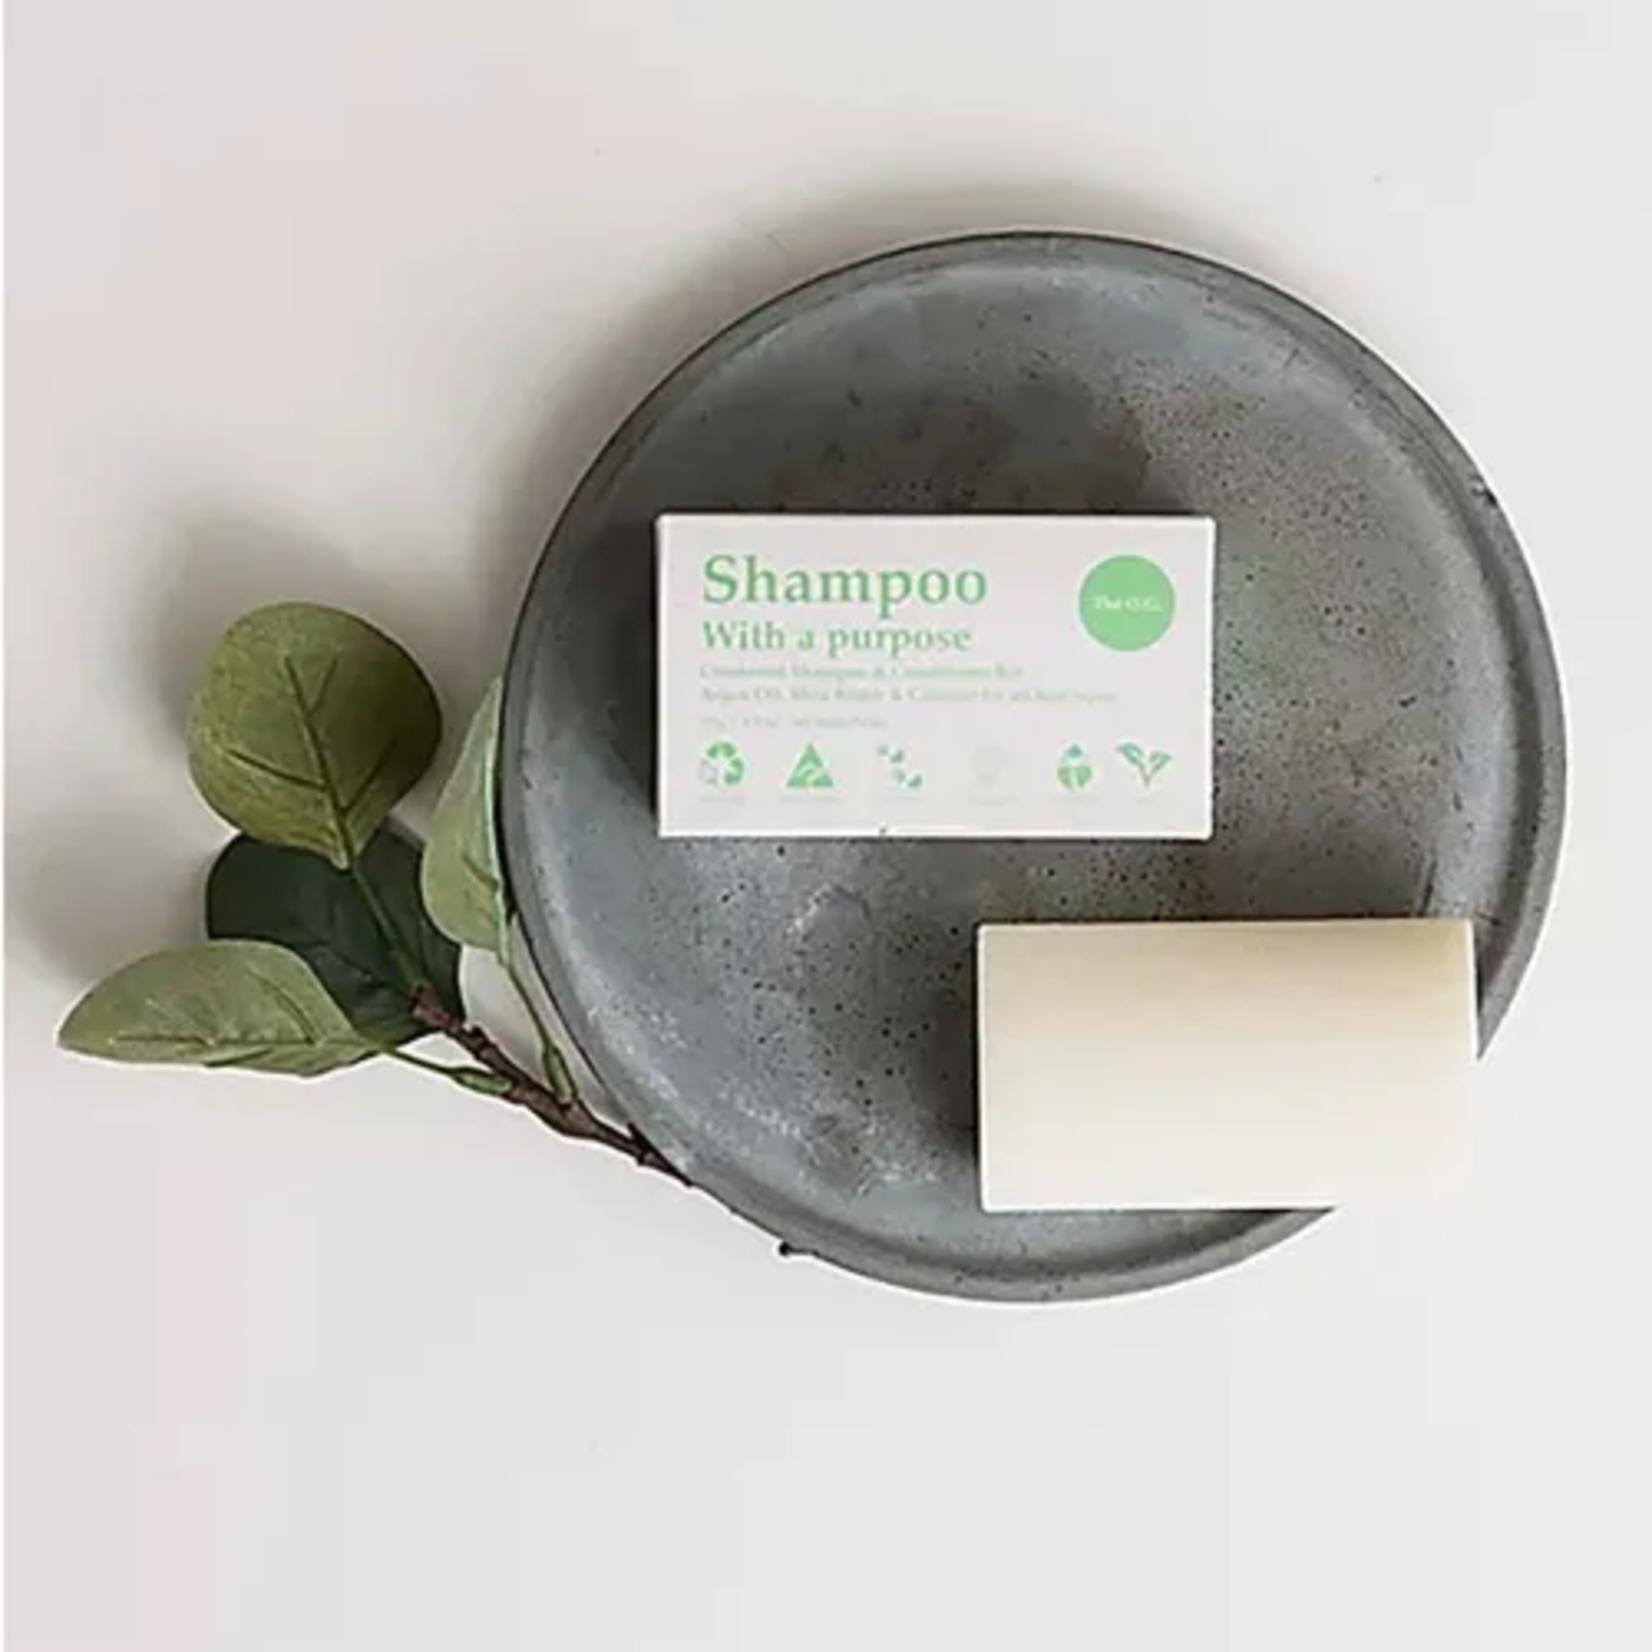 Shampoo With a Purpose Shampoo With A Purpose - OG